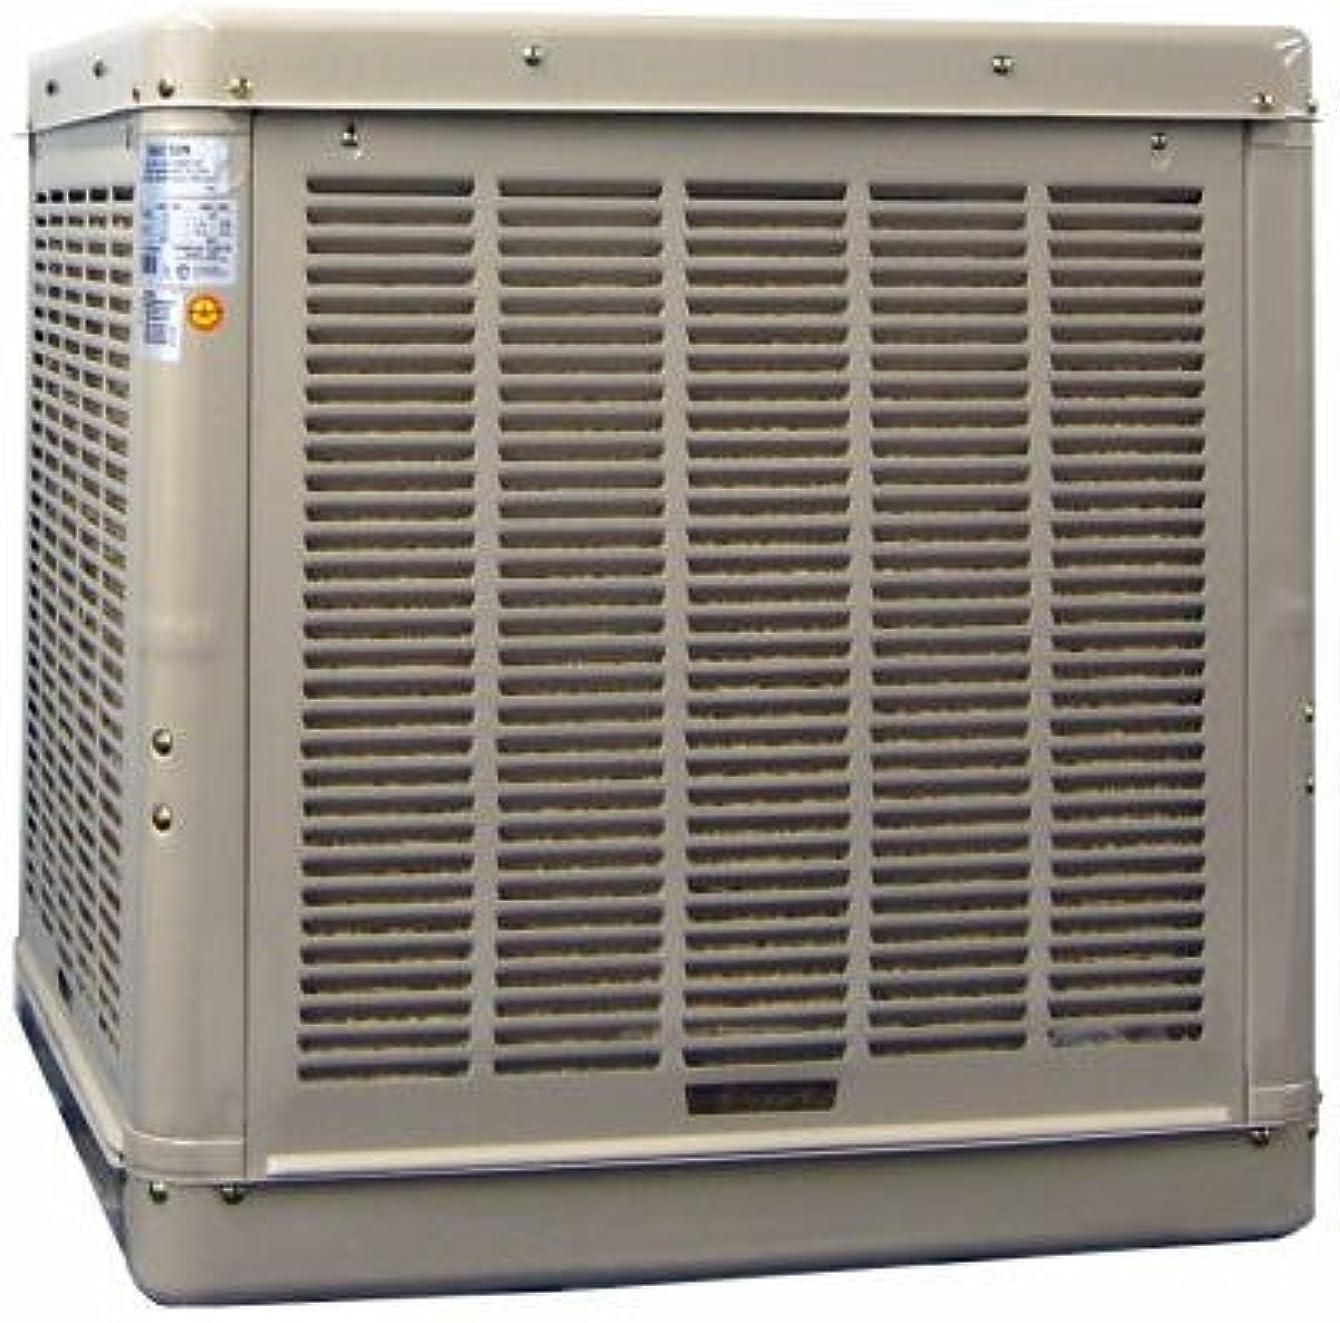 CHAMPION 3000DD Dd Cabinet Evaporative Cooler